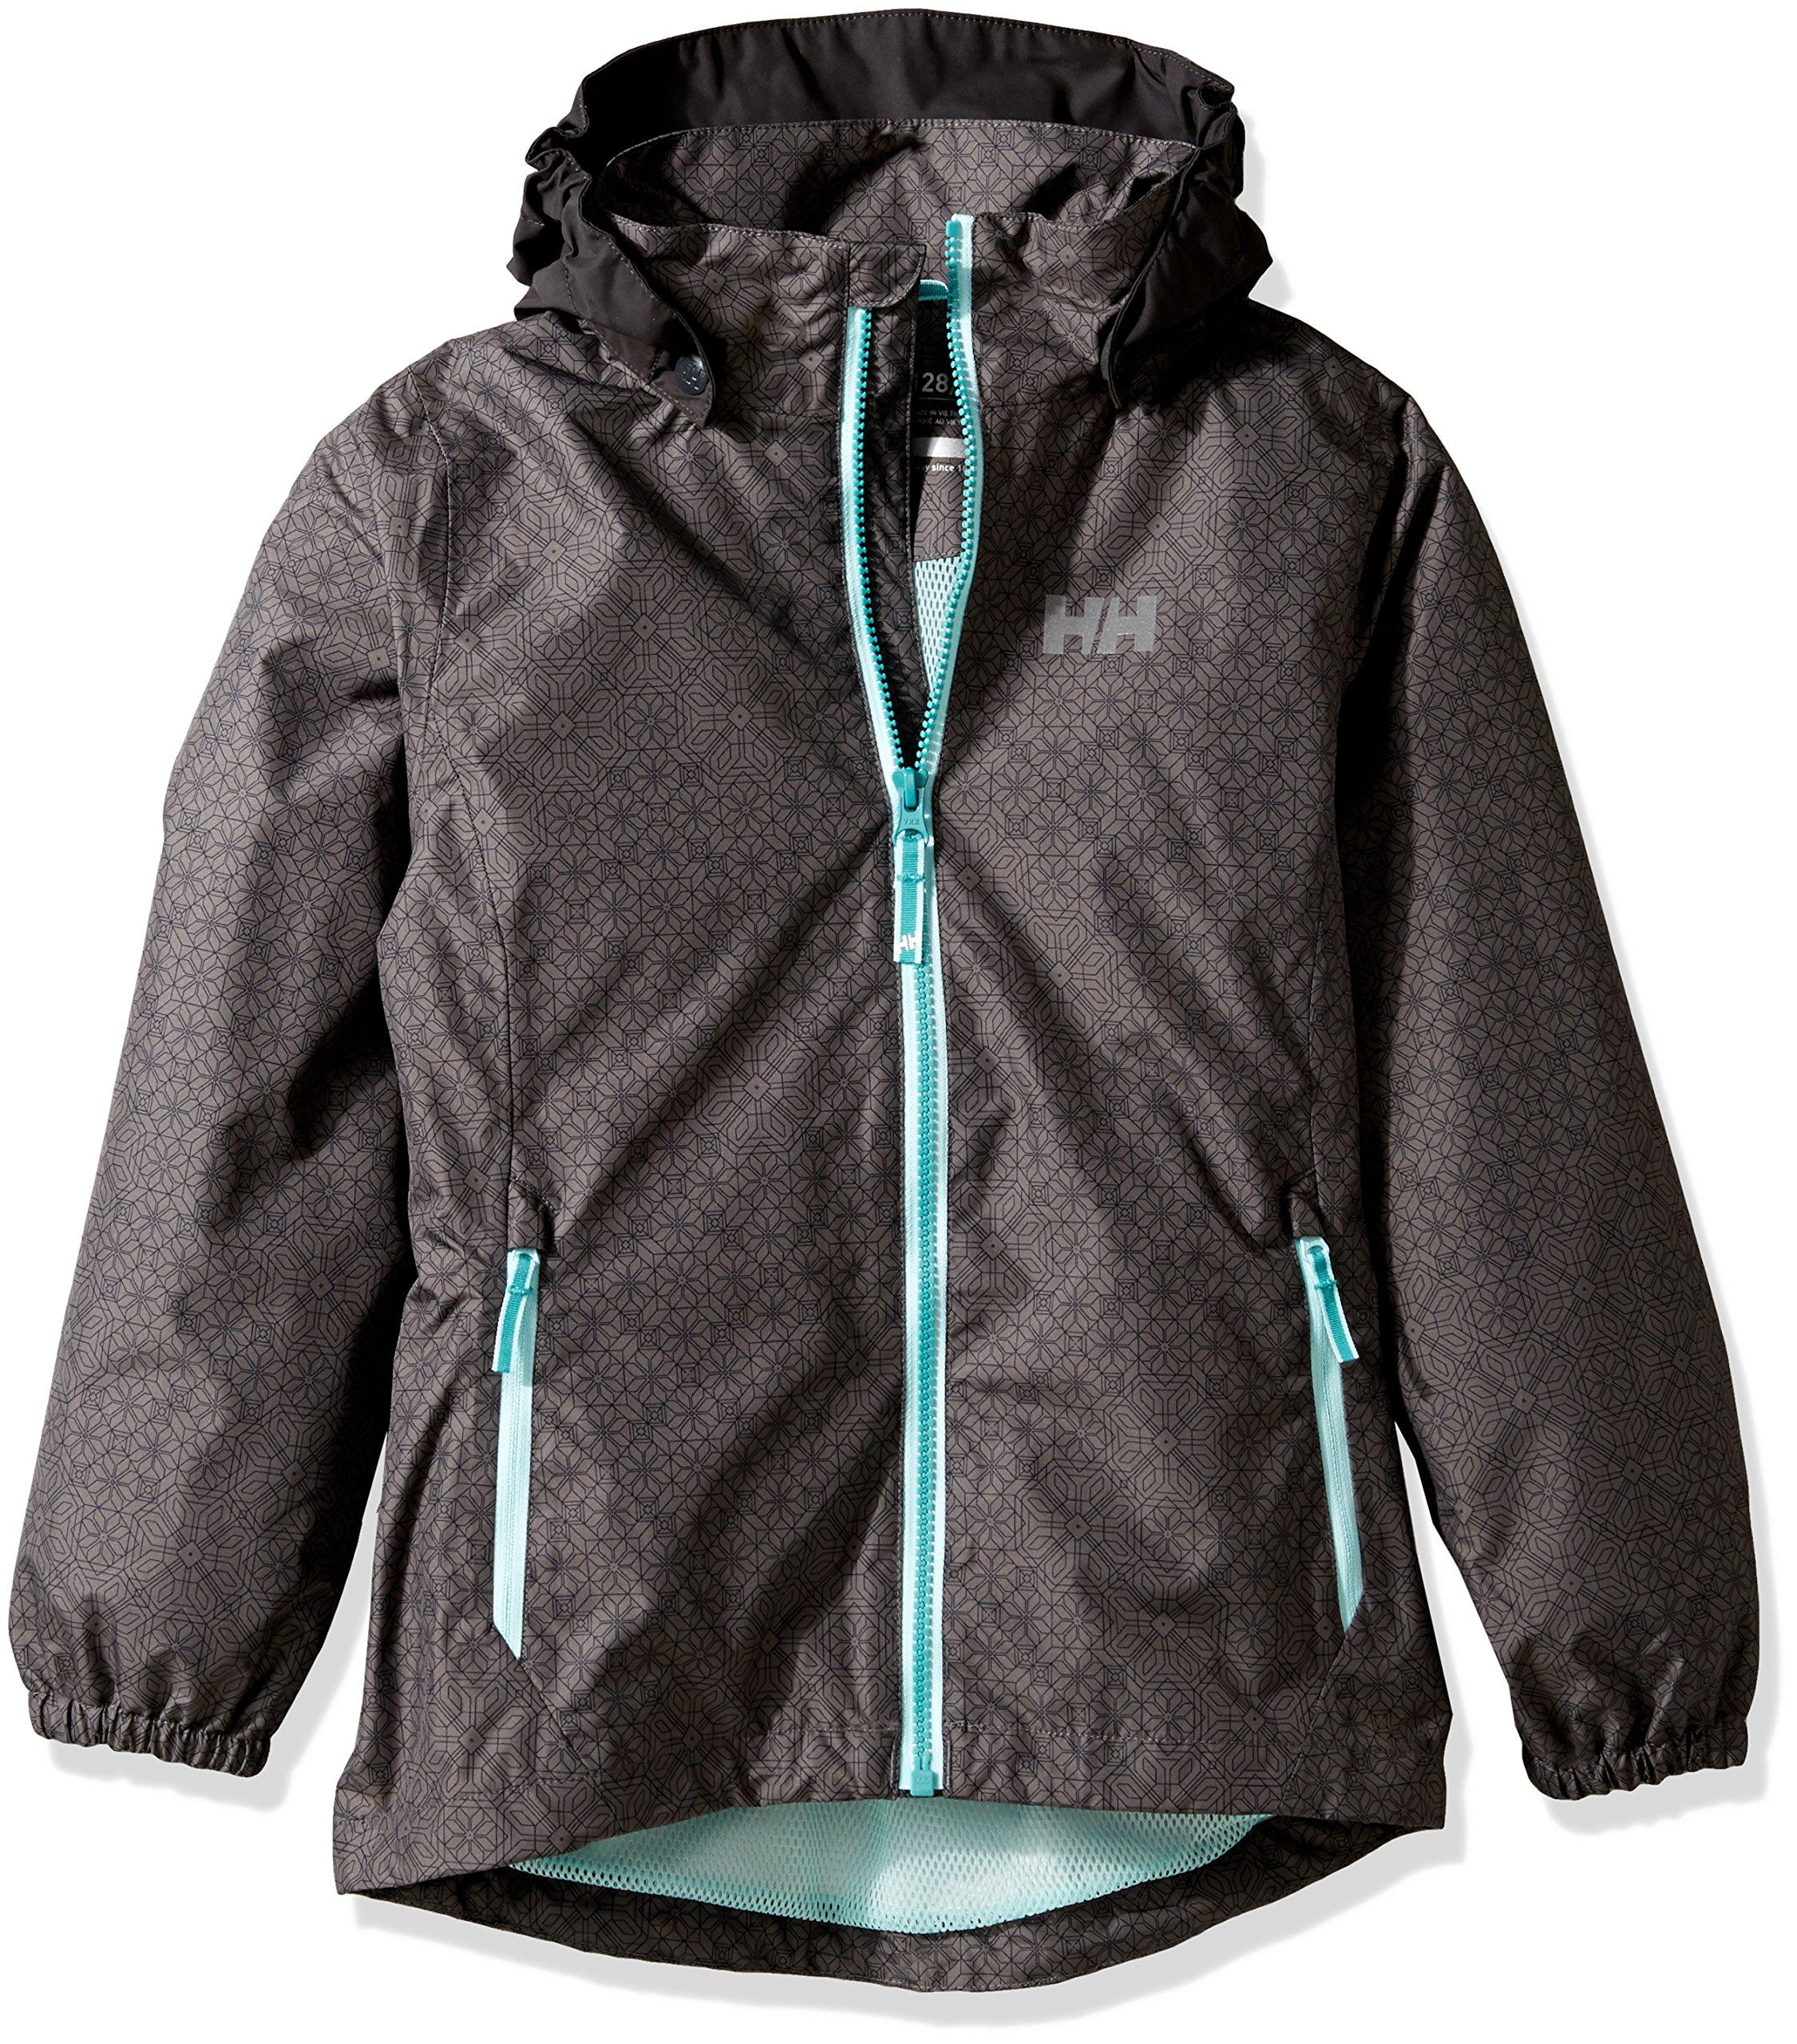 Helly Hansen Girls Freya Rain Jacket, Size 10, Charcoal Print